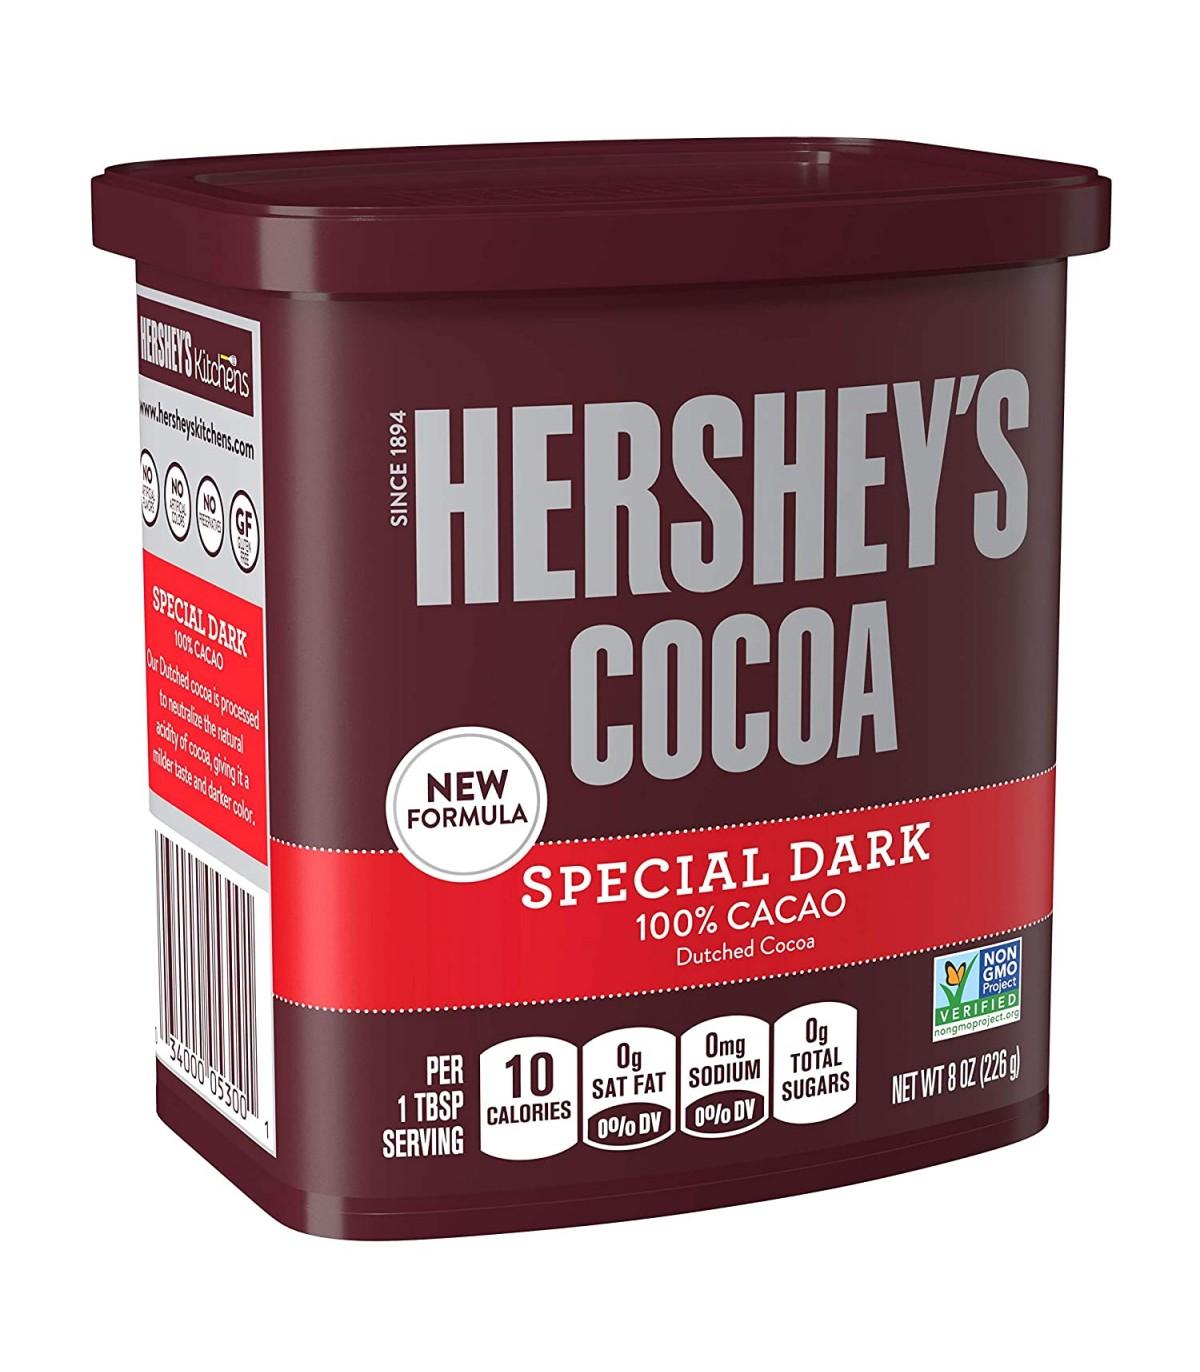 Hersheys پودر کاکائو خالص دارک مخصوص بدون شکر 226 گرم هرشیز